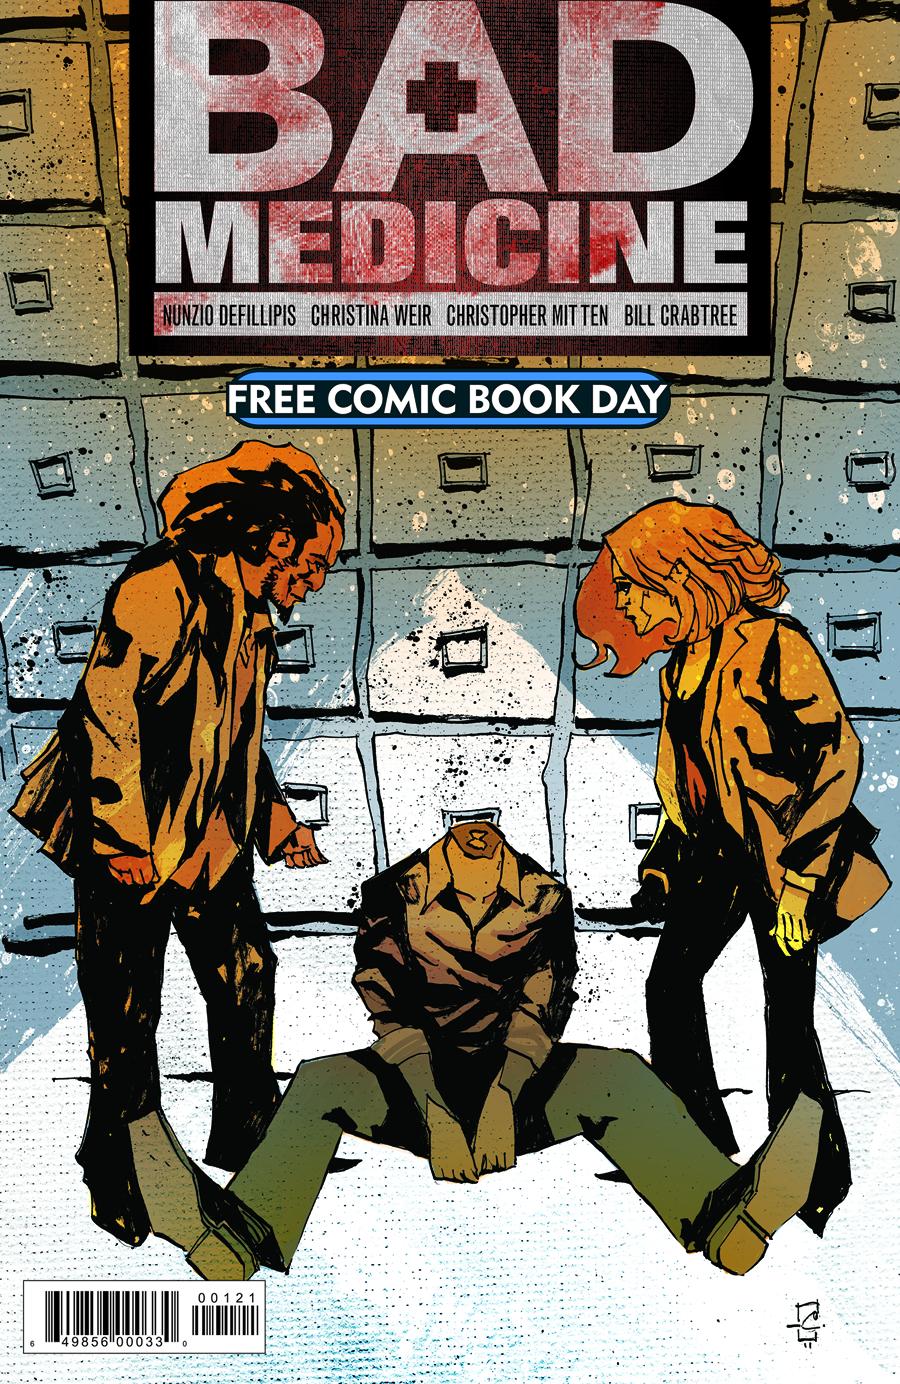 STK459883 Free Comic Book Day 2012: Reviews!